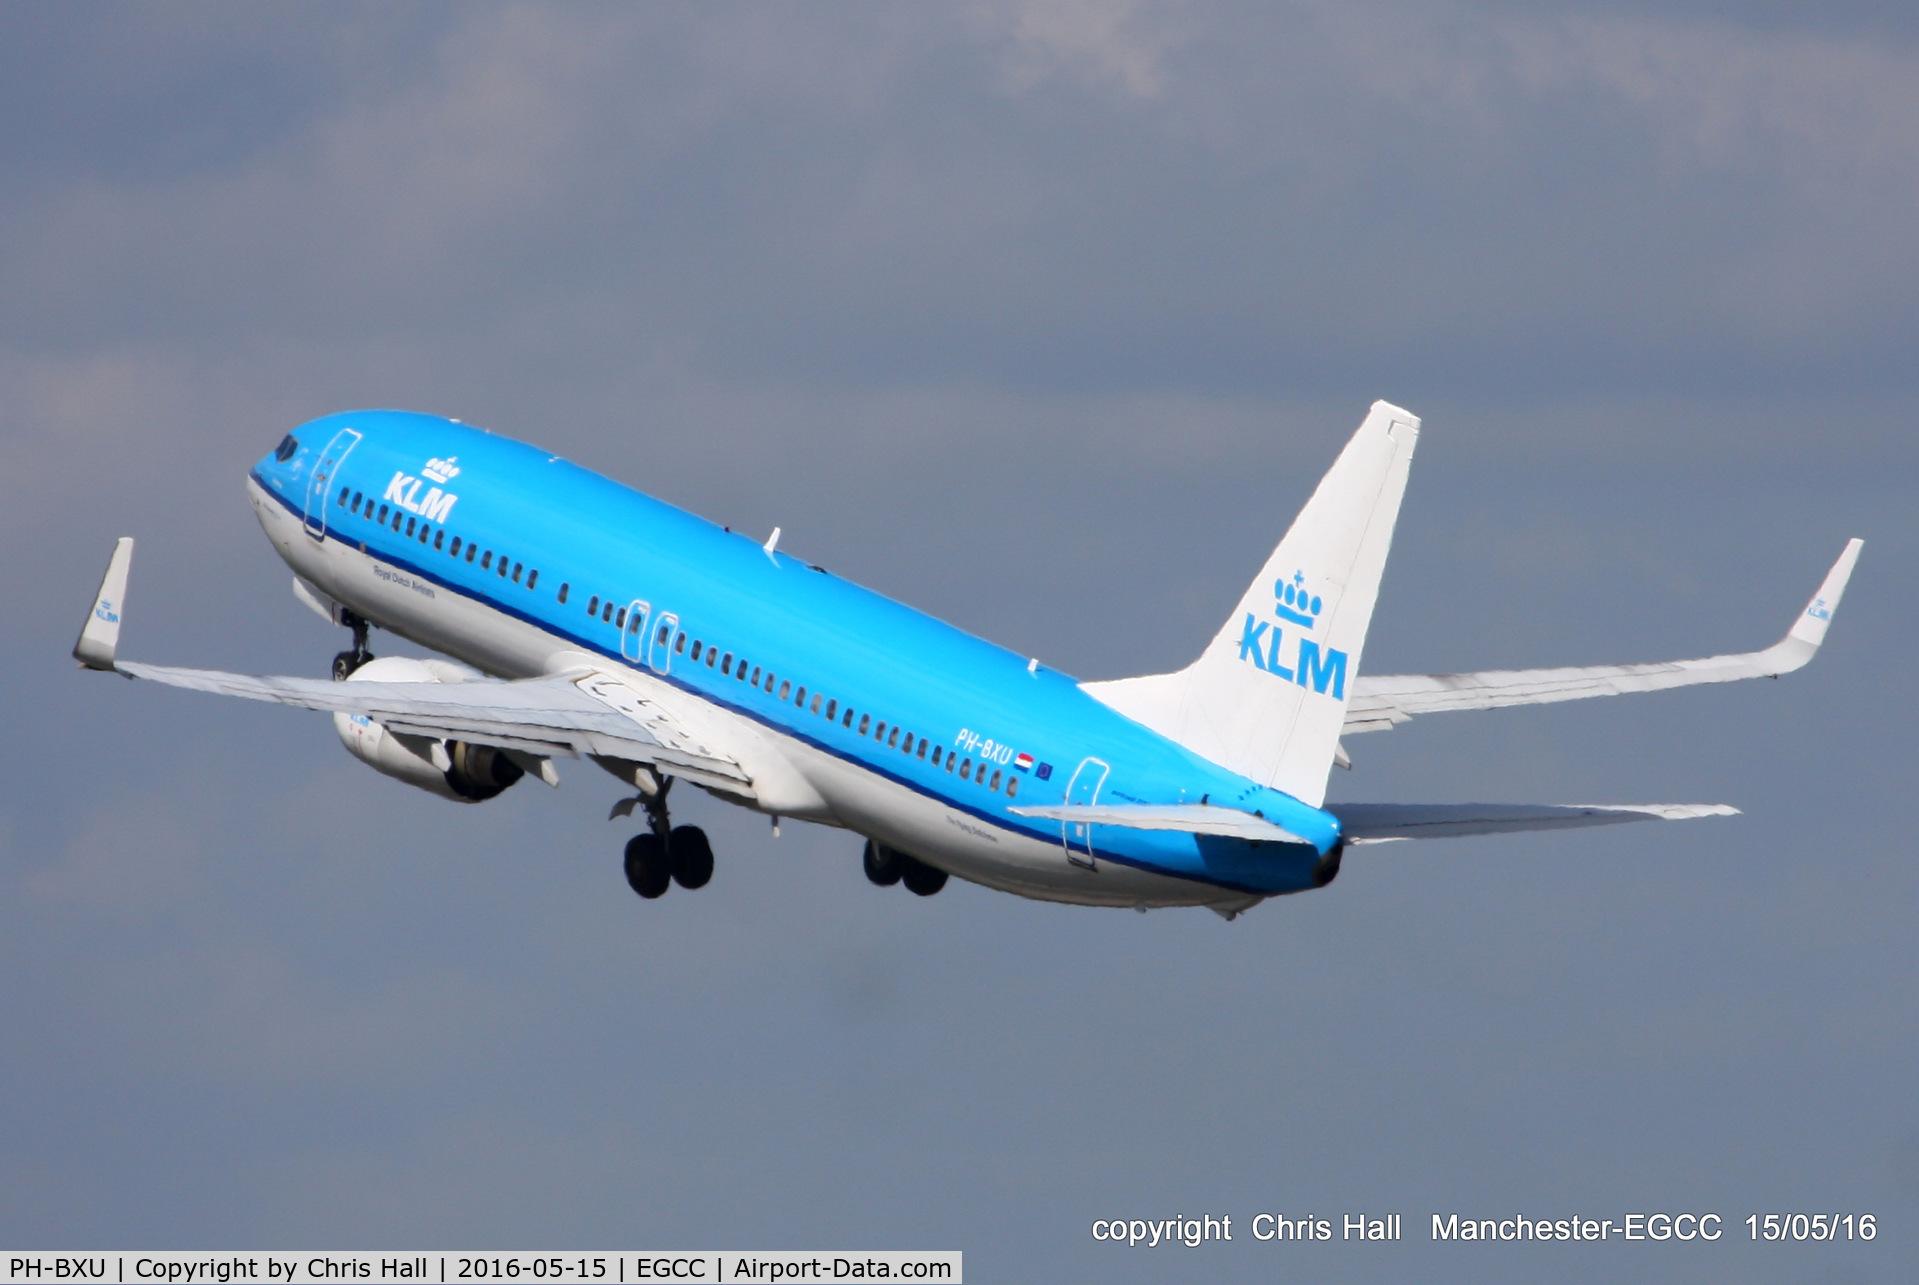 PH-BXU, 2006 Boeing 737-8BK C/N 33028, KLM Royal Dutch Airlines